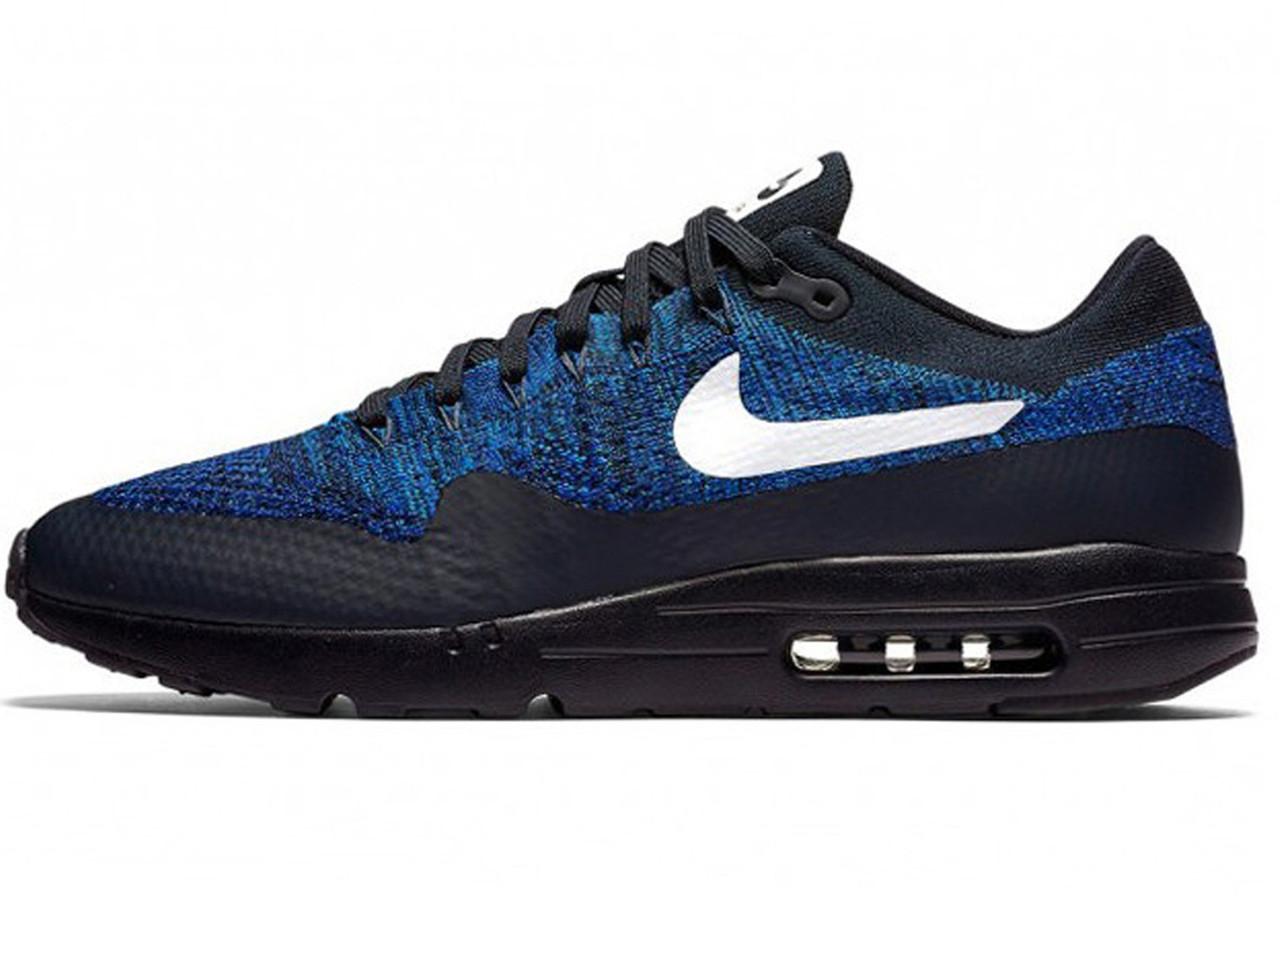 723ad08b70d0 Мужские кроссовки Nike Air Max 87 ultra flyknit black blue (Реплика ААА+)